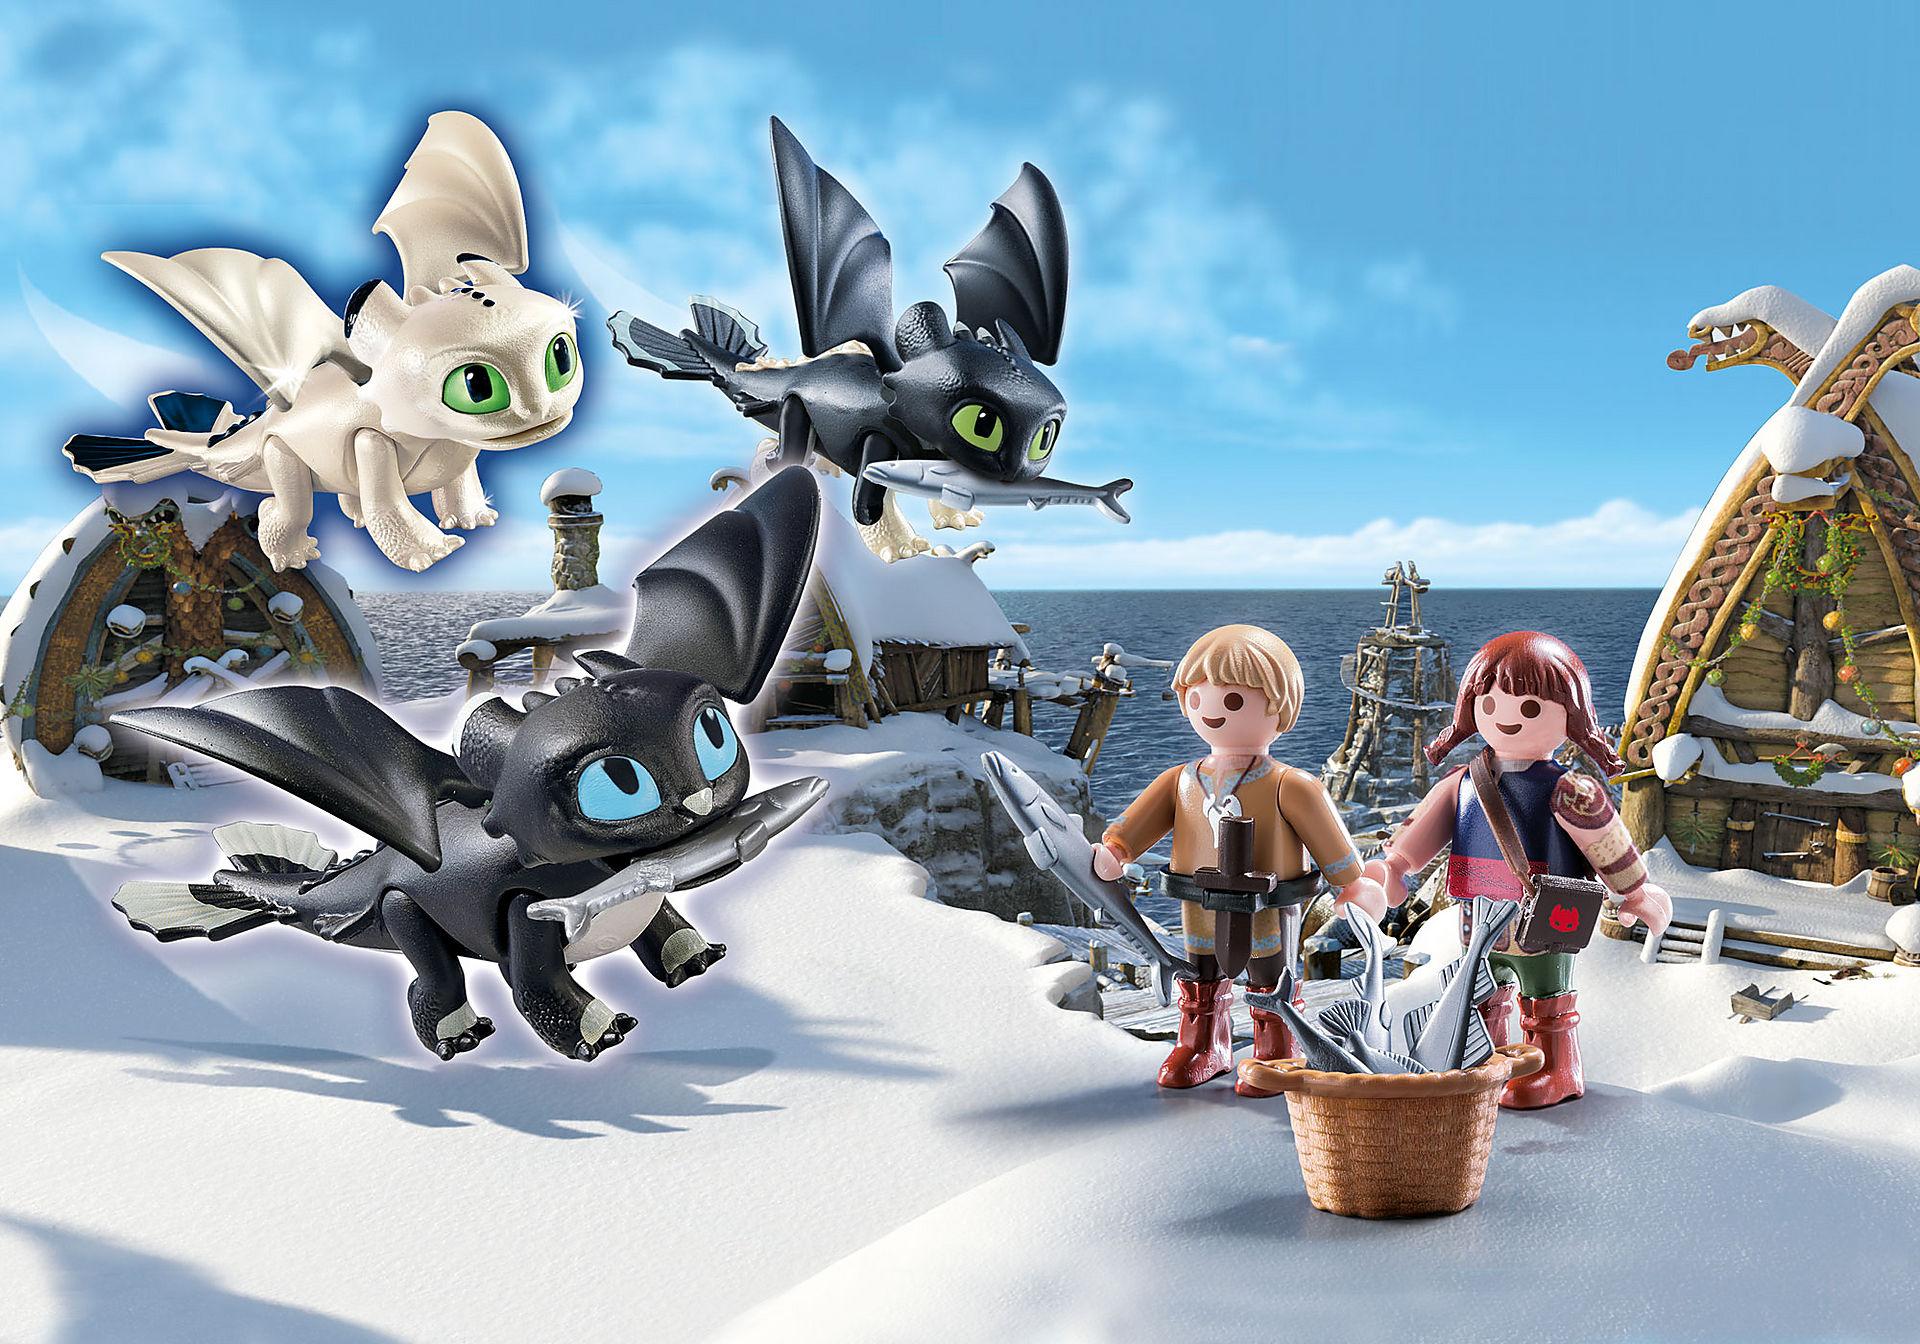 http://media.playmobil.com/i/playmobil/70457_product_detail/Tre Baby Dragons con bambini